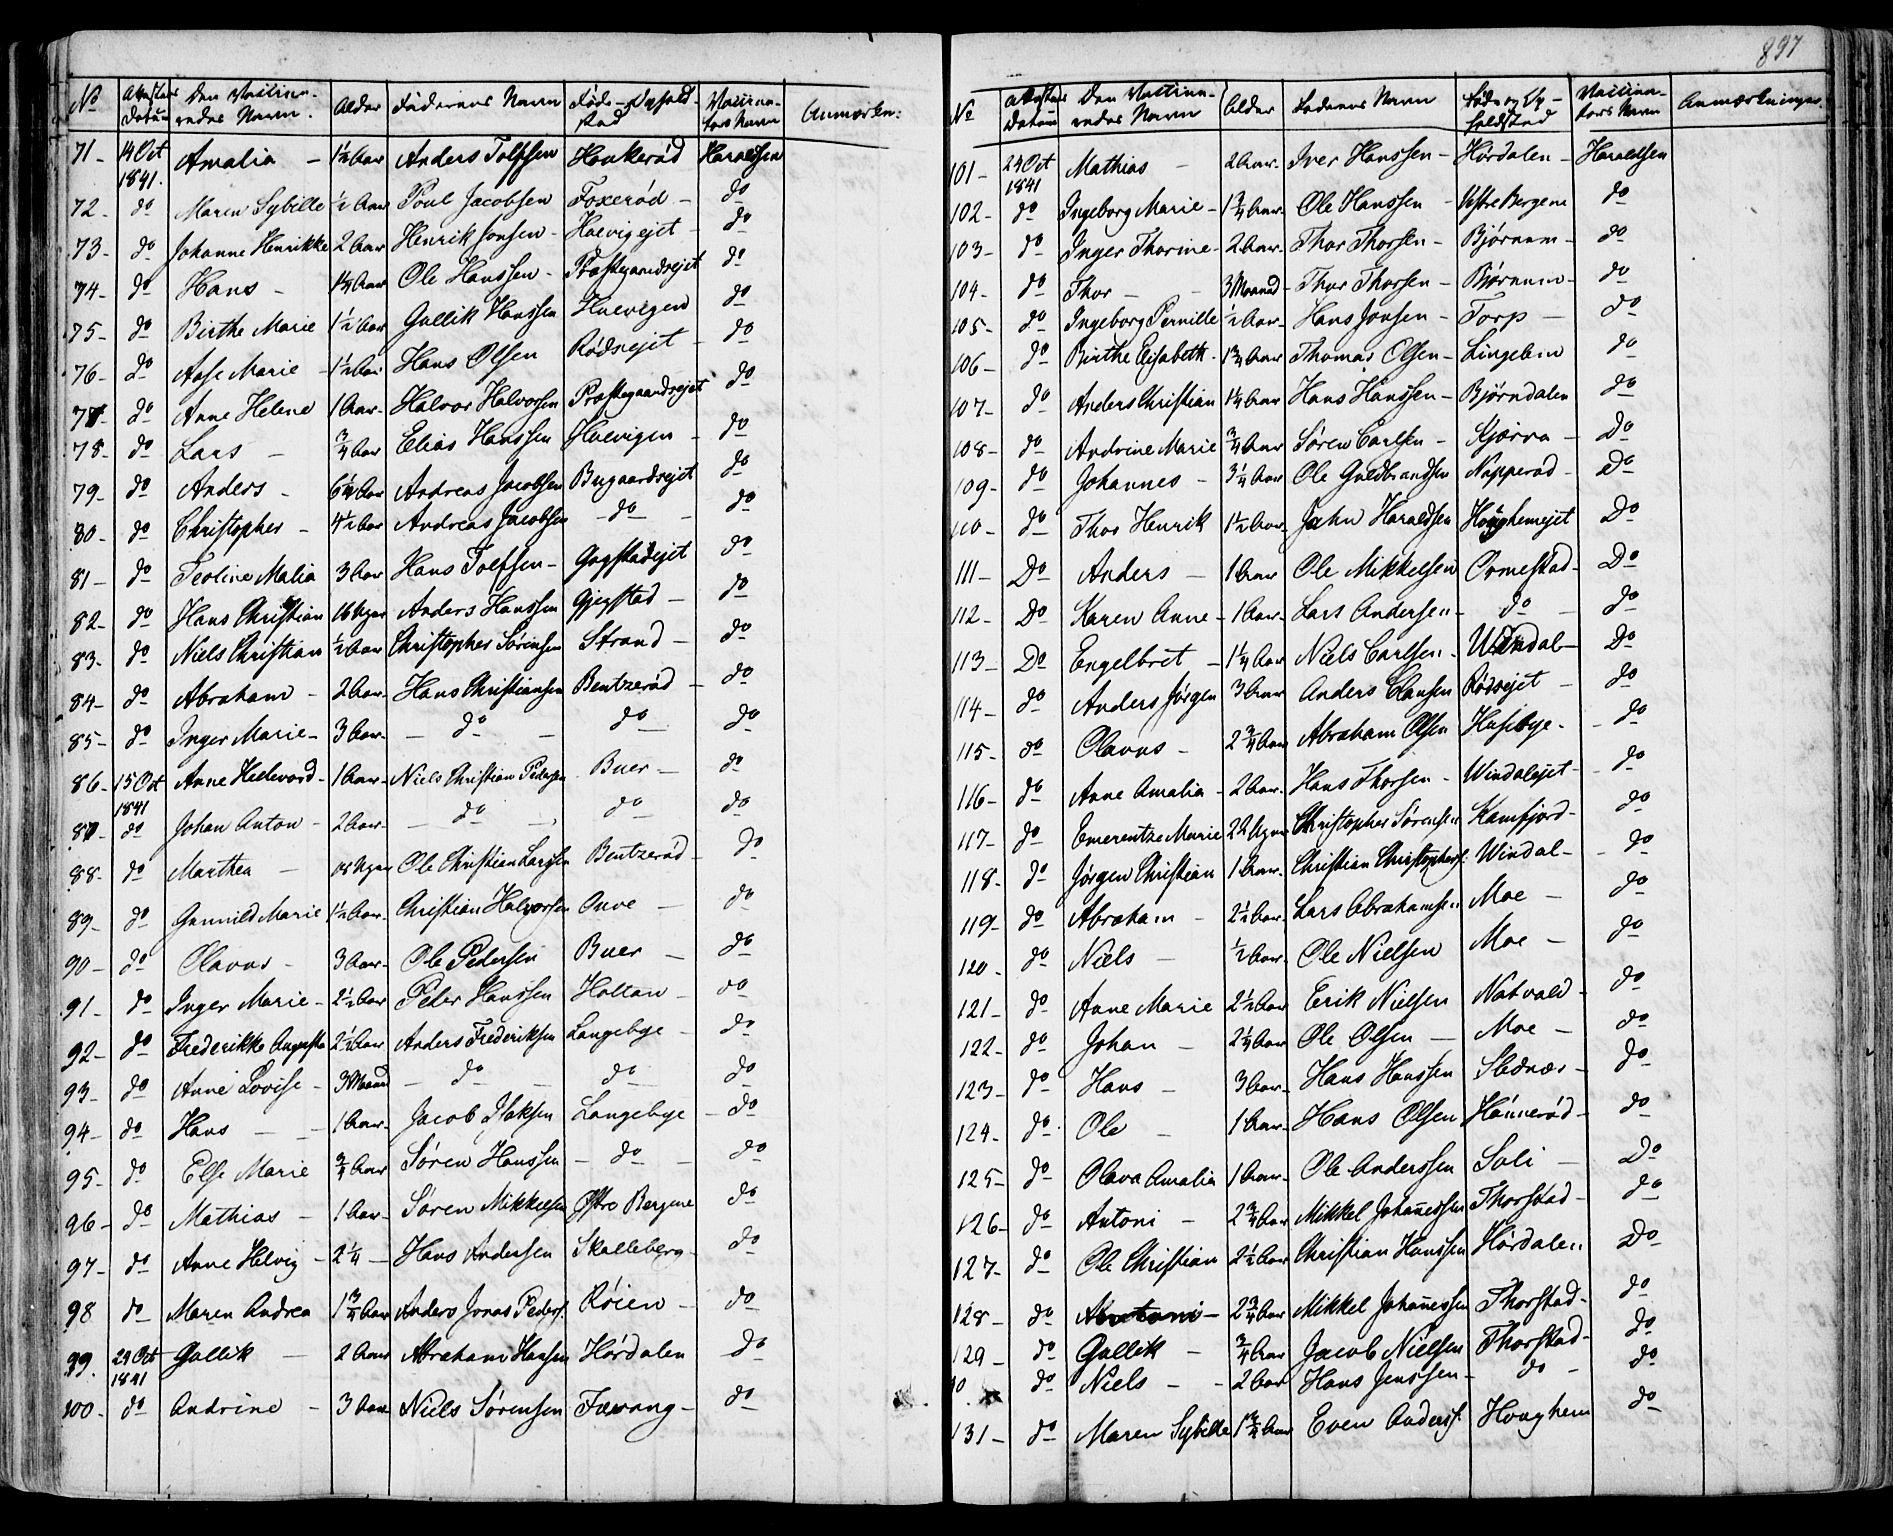 SAKO, Sandar kirkebøker, F/Fa/L0005: Parish register (official) no. 5, 1832-1847, p. 896-897